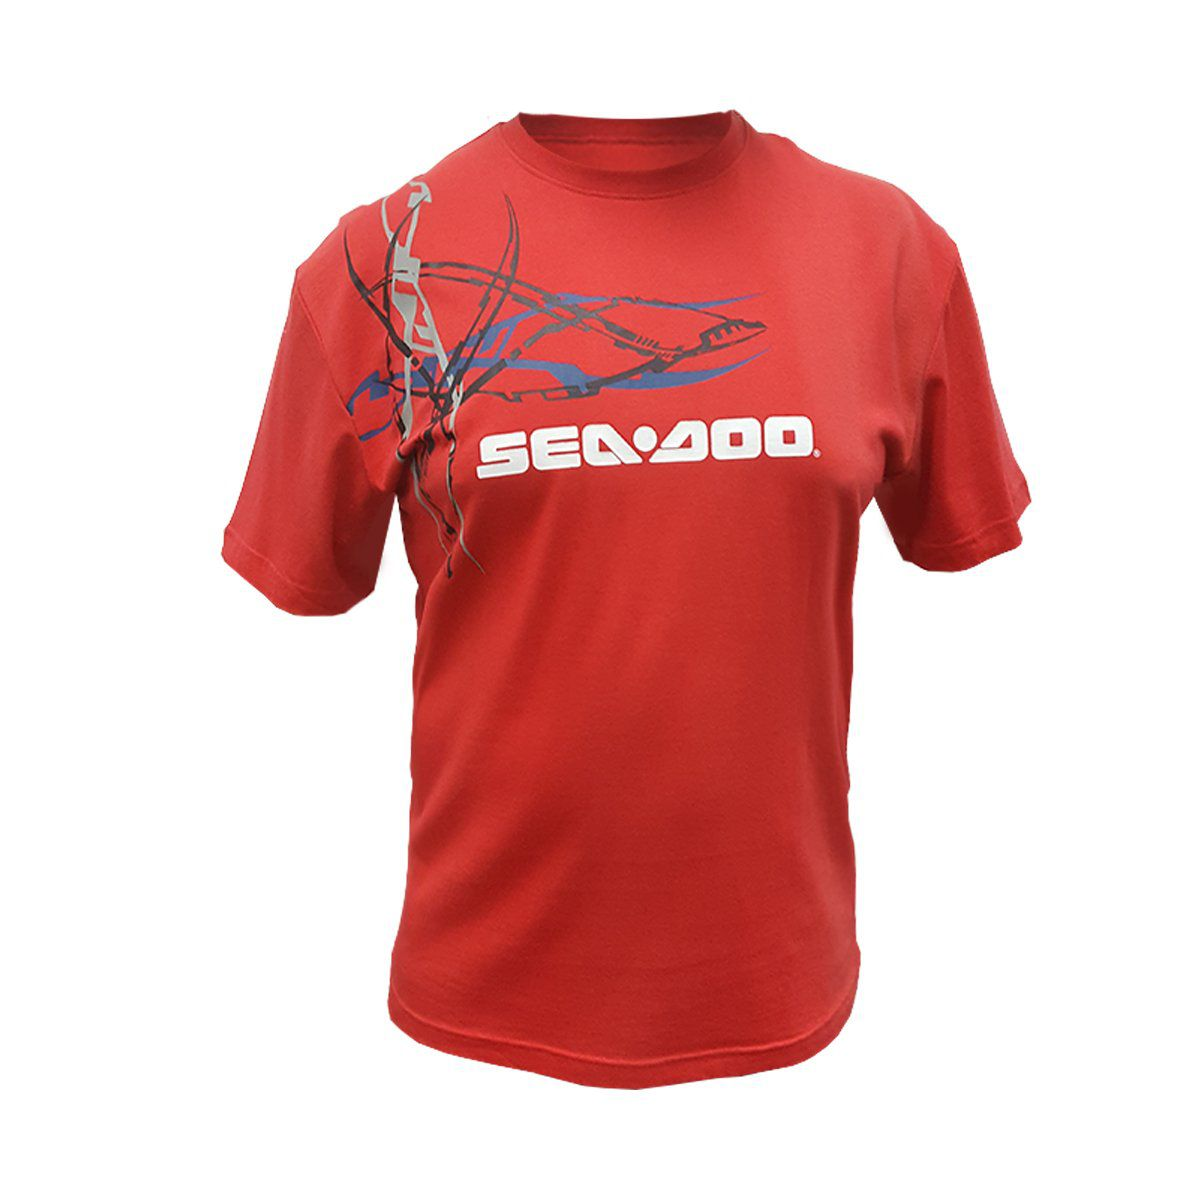 Camiseta Tee Sea-Doo Masculina Vermelha